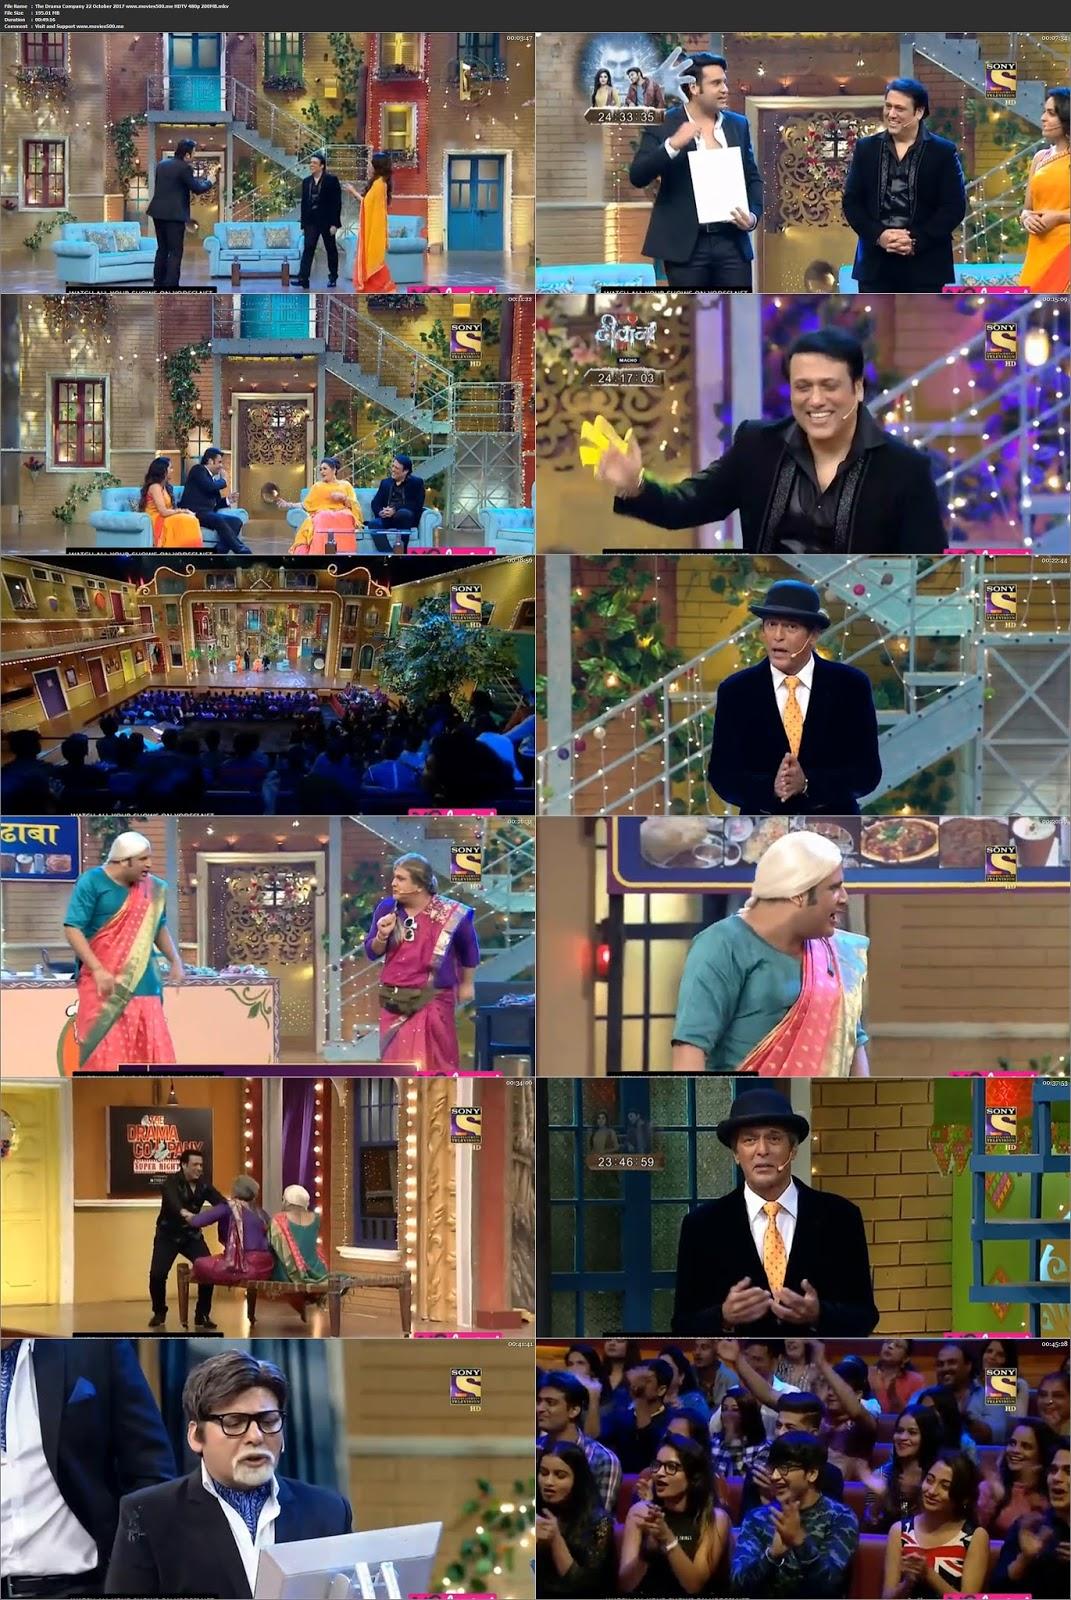 The Drama Company 22 October 2017 Full Show 195MB HDTV 480p at tokenguy.com